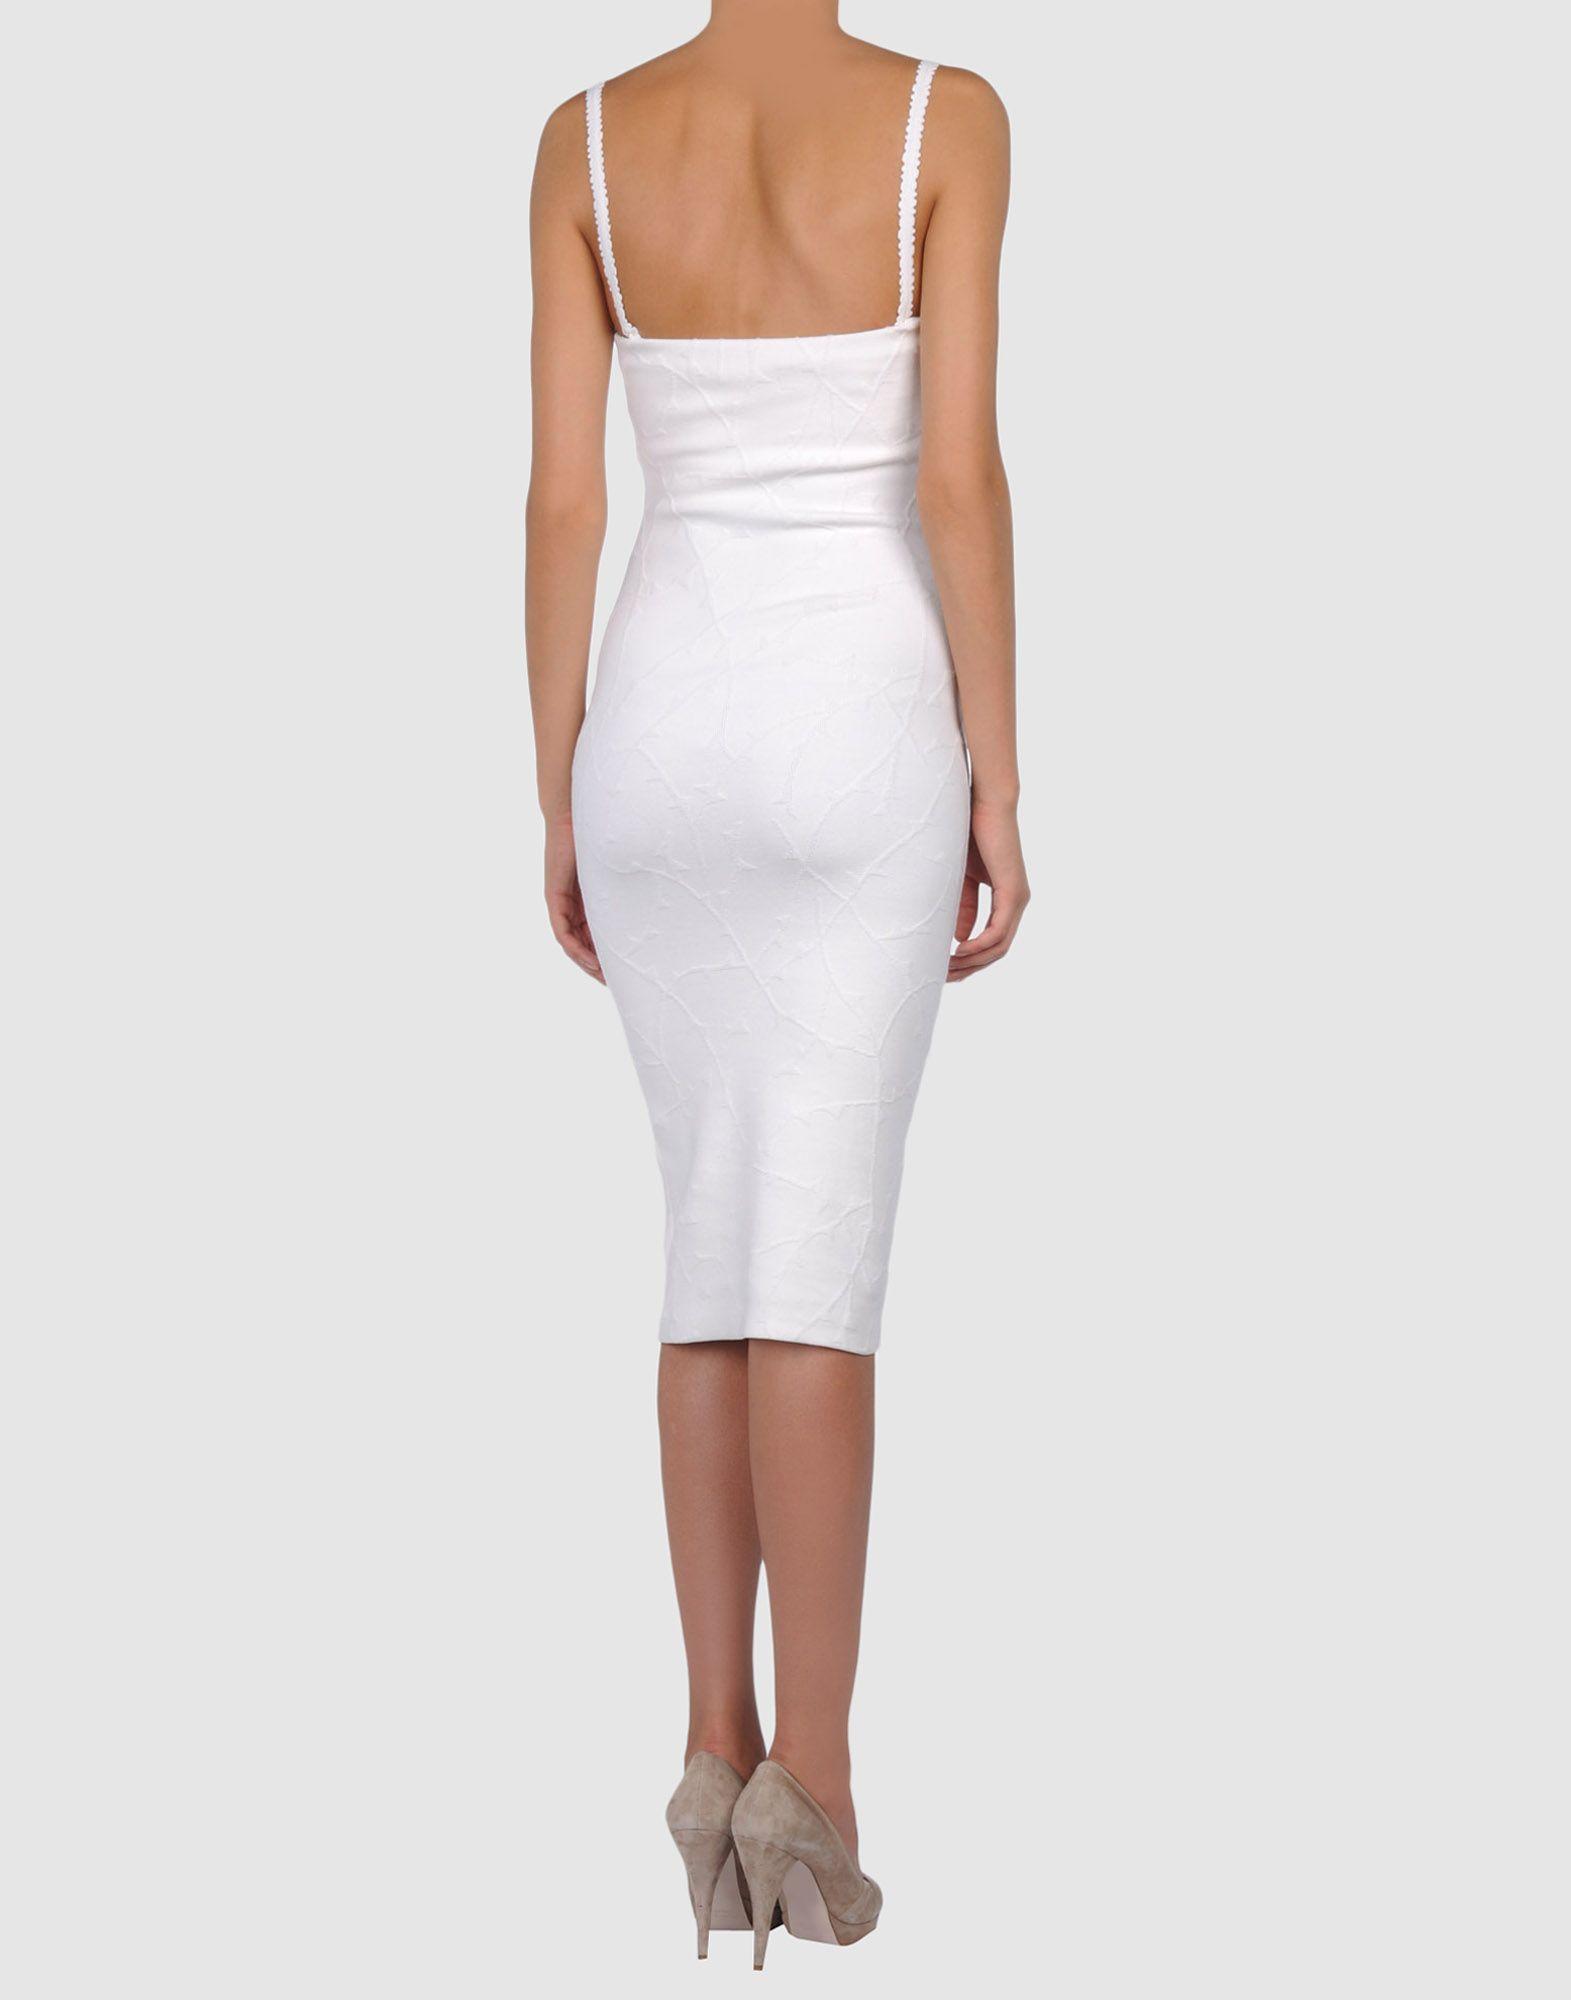 34222369FS 14 r - Βραδυνα Φορεματα Yves Saint Laurent Rive Gauche Κωδ.45